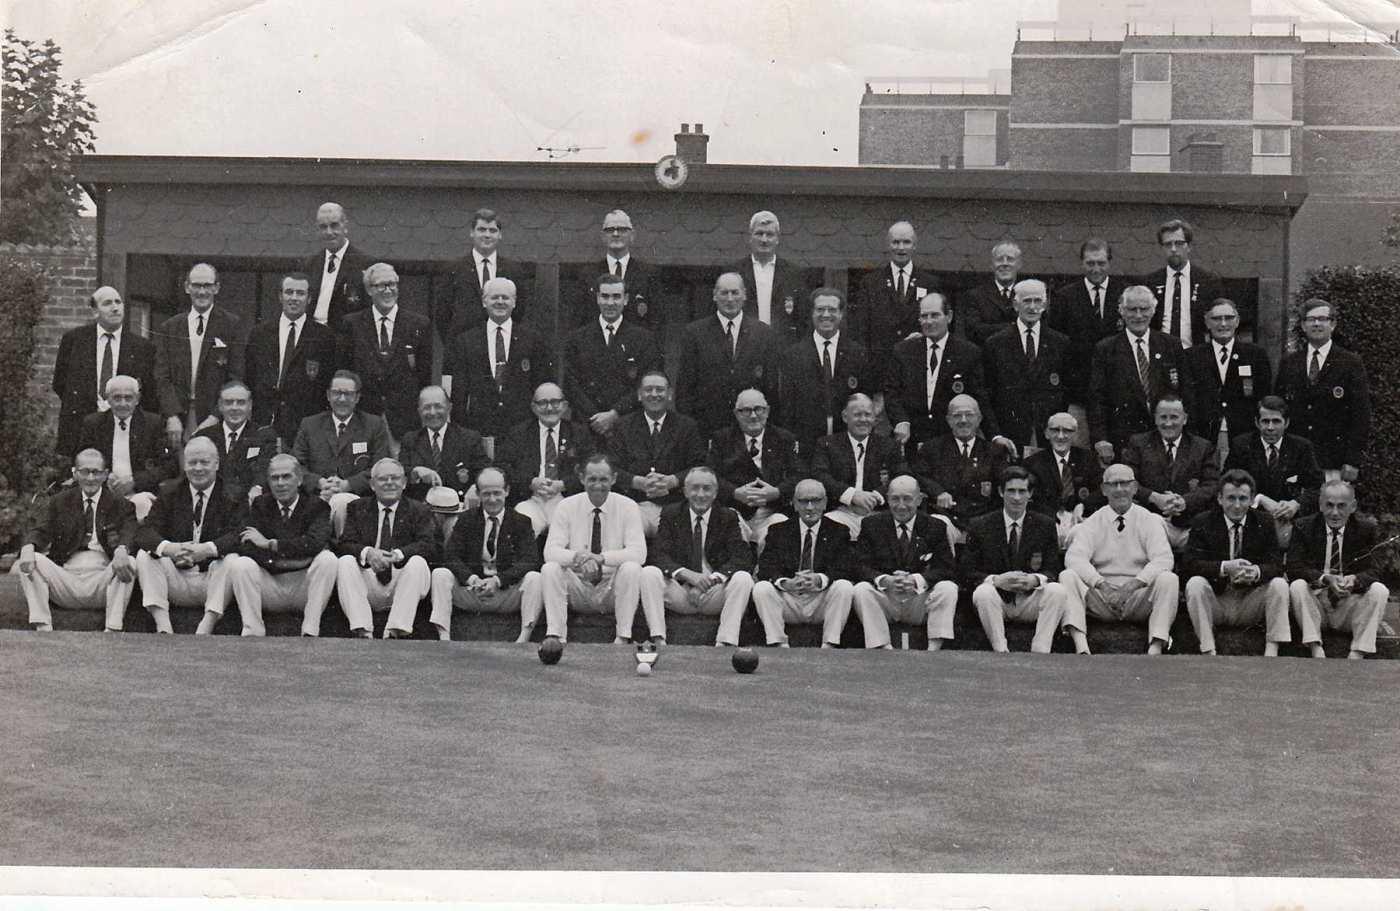 Sth London Bowling Club 1970 a